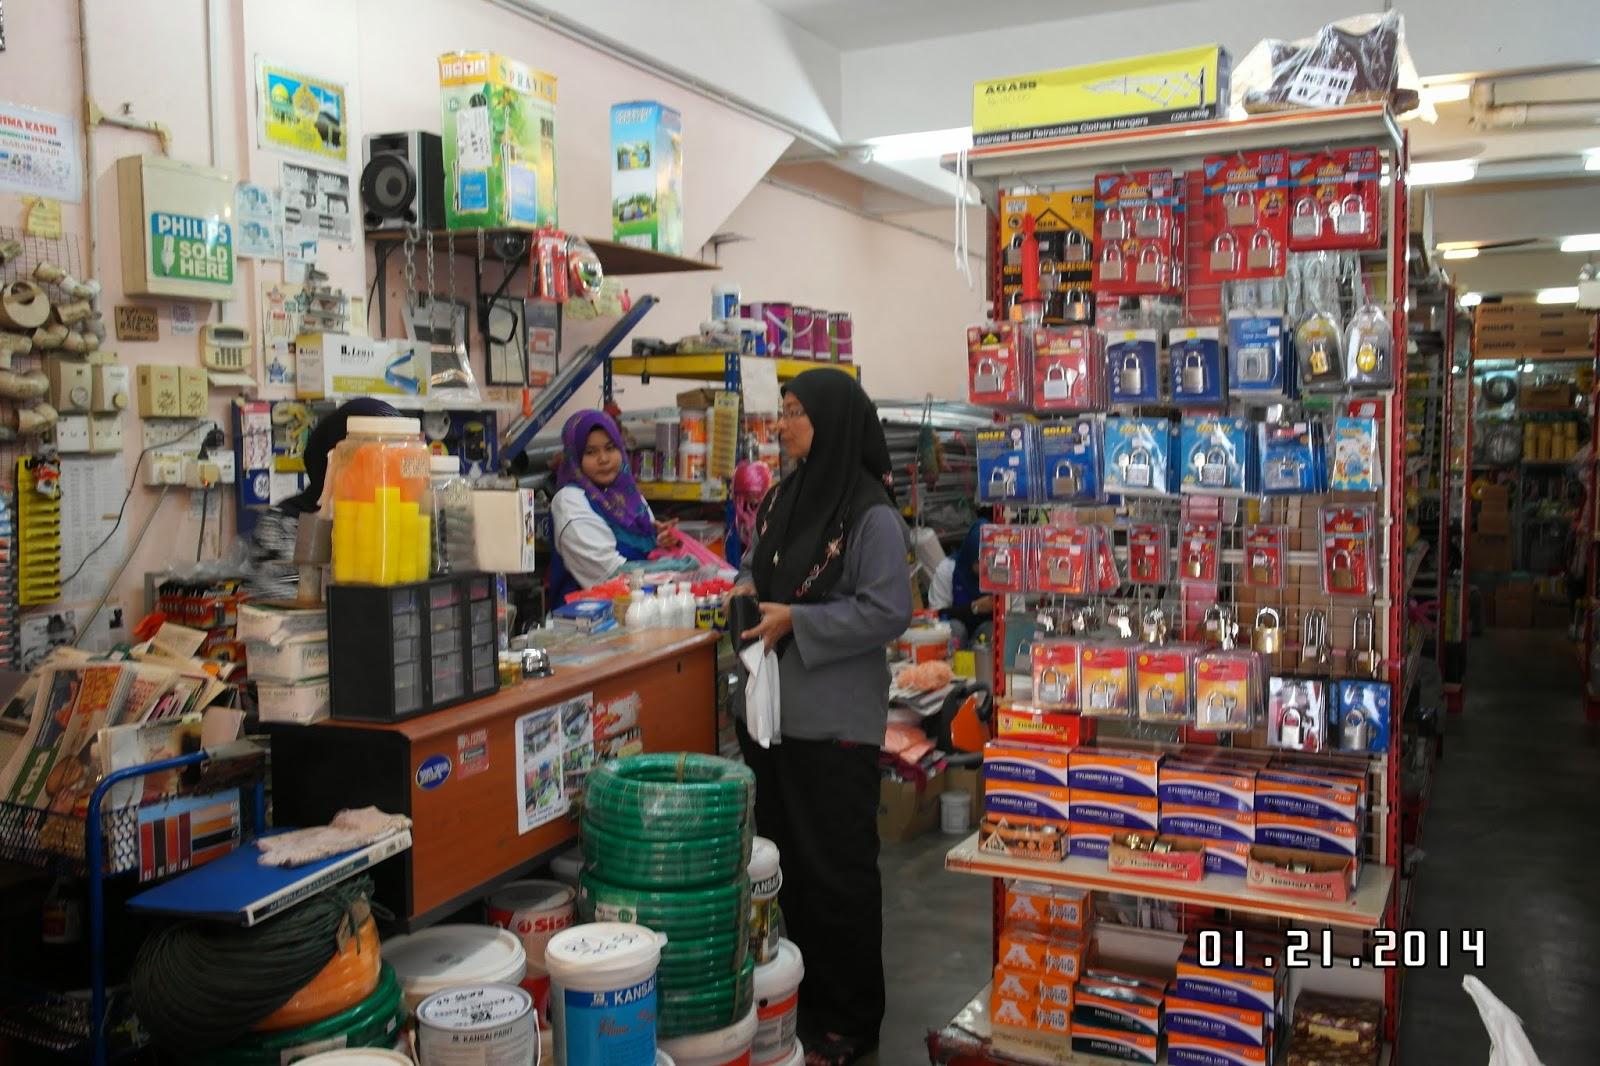 Berita Baik Buat Pengguna Di Sekitar Yih Selangor Stokis Hijrah Hardware Sentral Ada Menjual Produk Keluaran Sarjani M Sdn Bhd